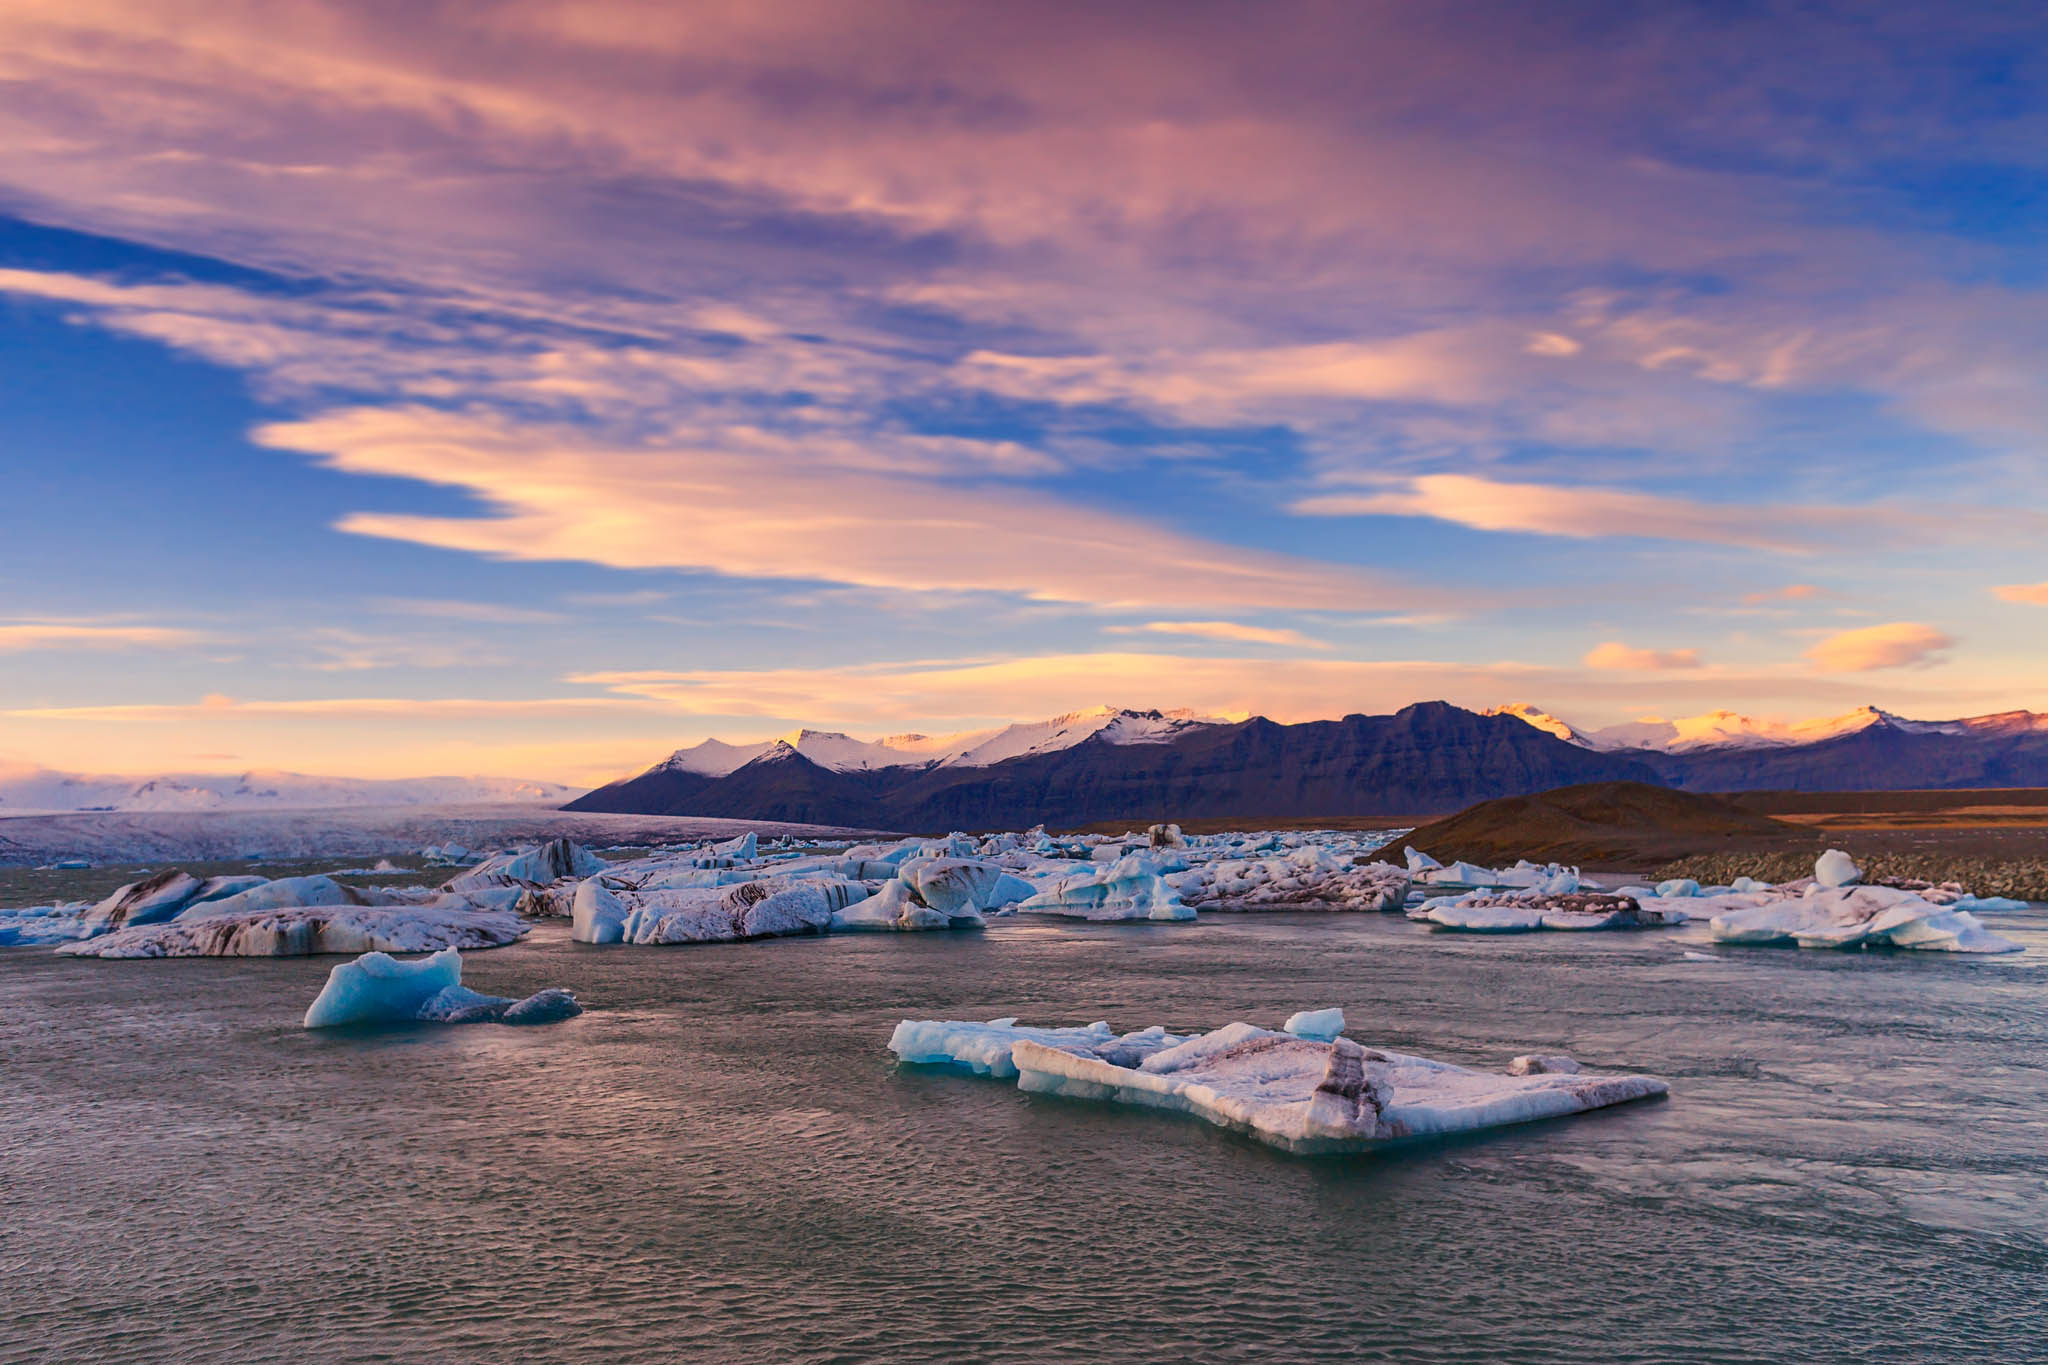 glacier lagoon, iceland, jennifer picard photography, travel photographer